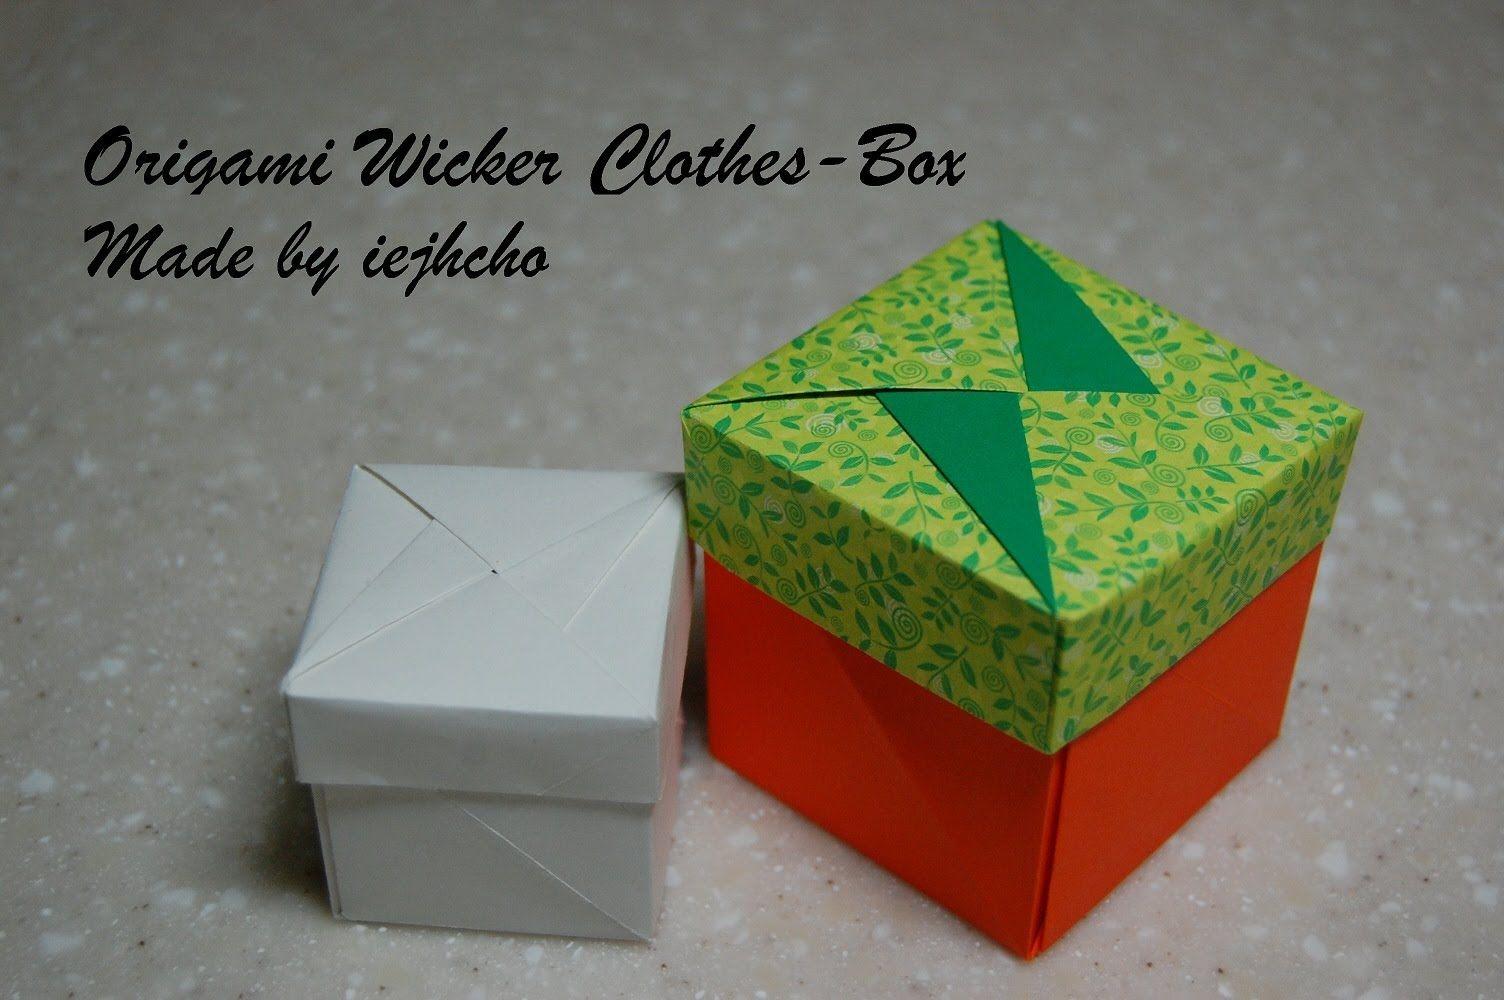 Origami Box(Wicker Clothes Box) Video / 종이접기 상자 접는 방법 동영상